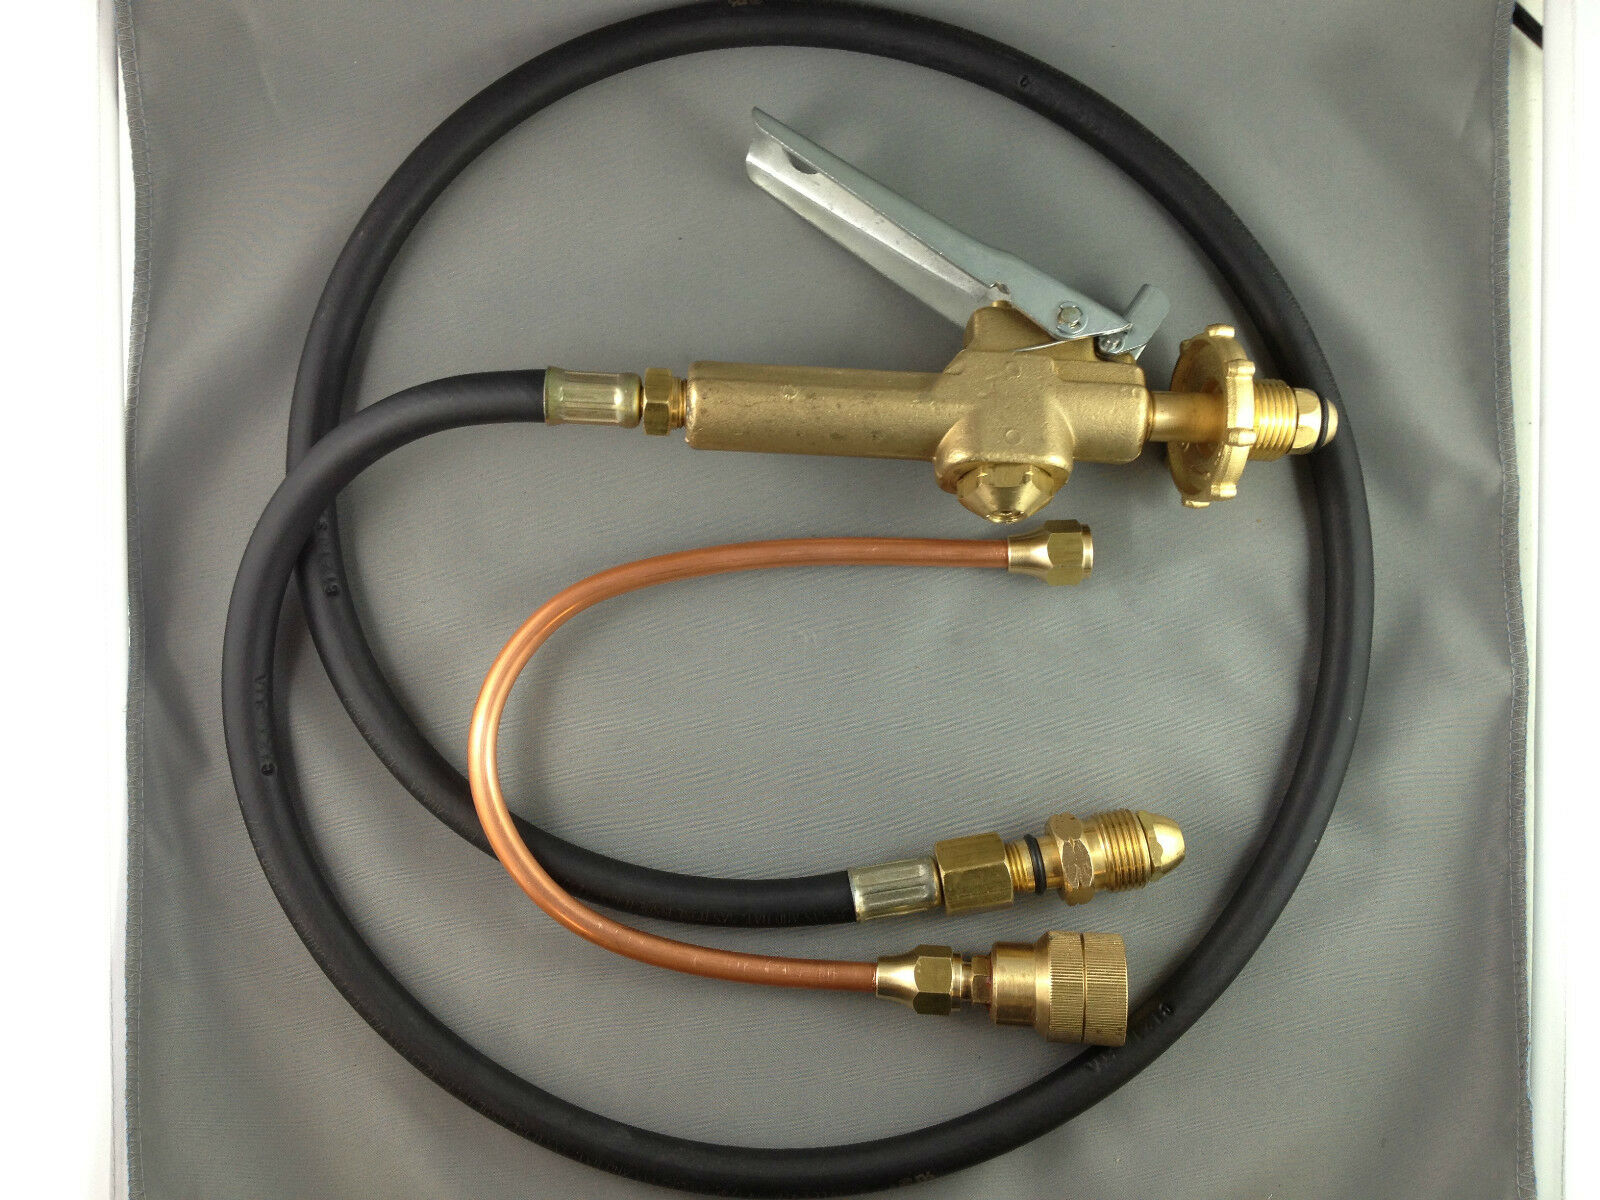 LPG Filler Gun u0026 Hose with Automotive LPG Tank Decanting Fitting. & LPG Filler Gun u0026 Hose with Automotive LPG Tank Decanting Fitting | eBay